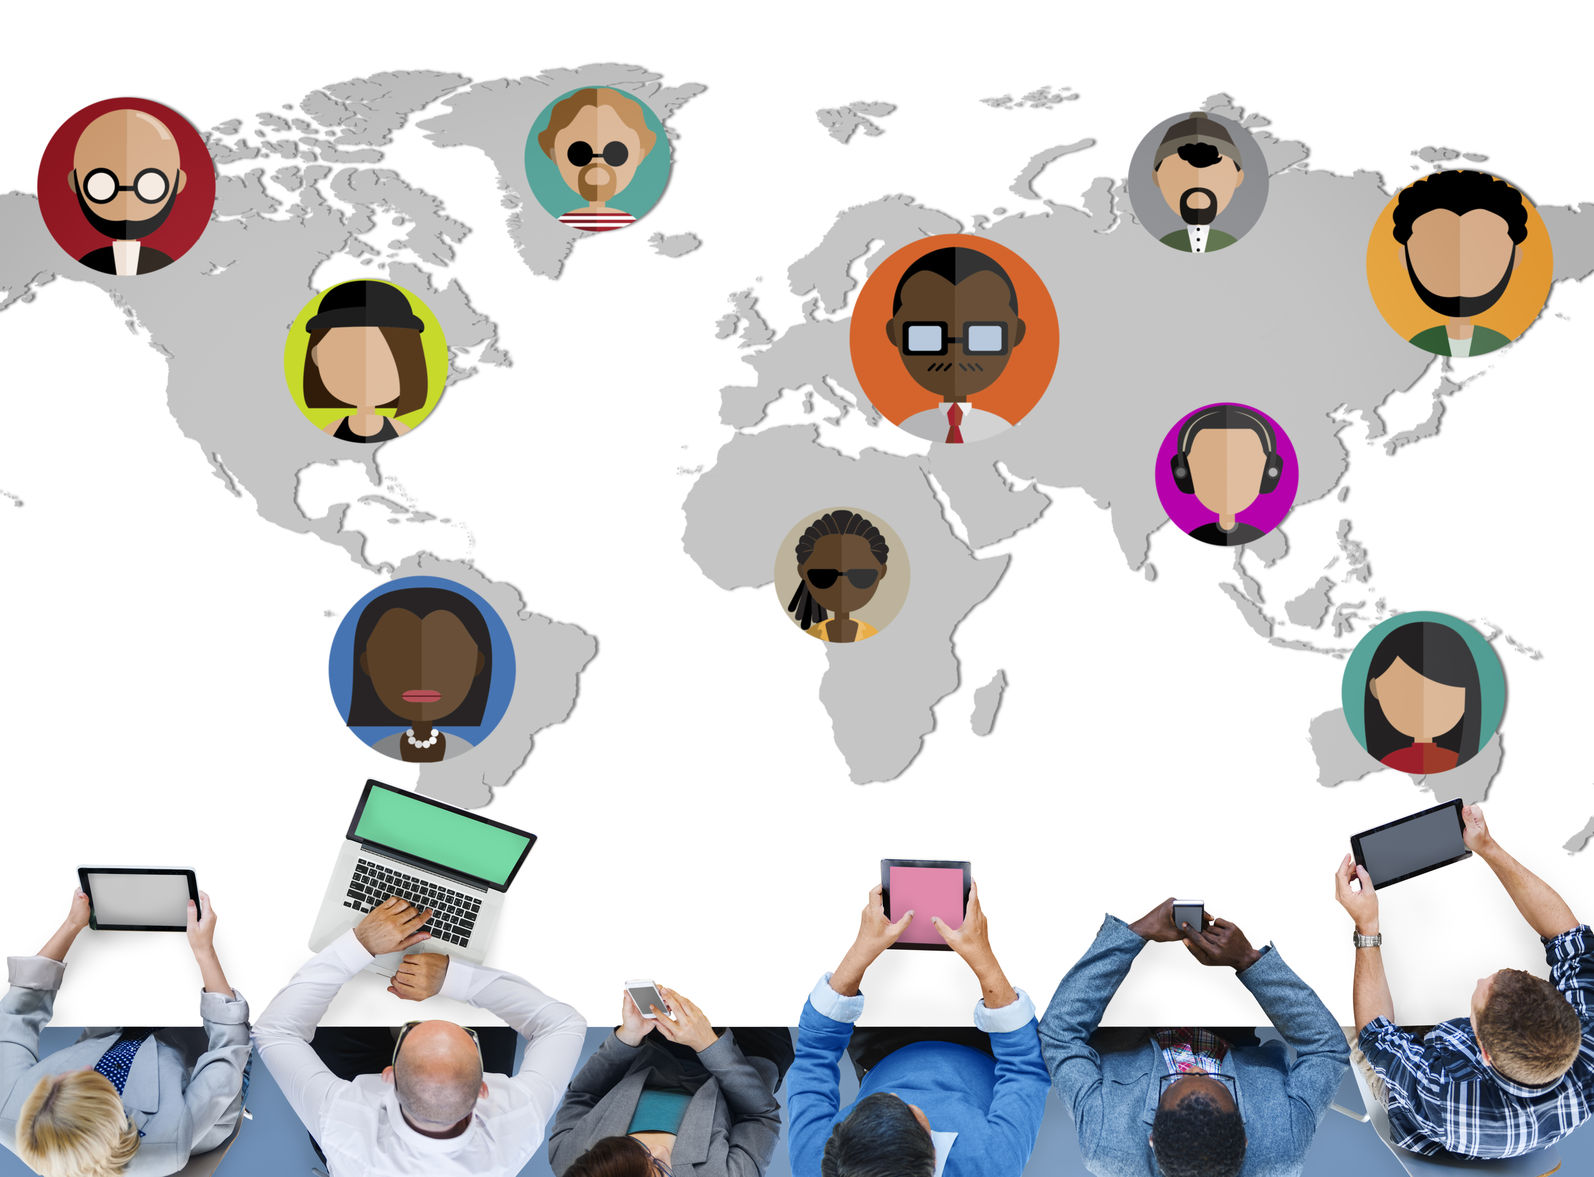 41422788 - global community world people international nationality concept